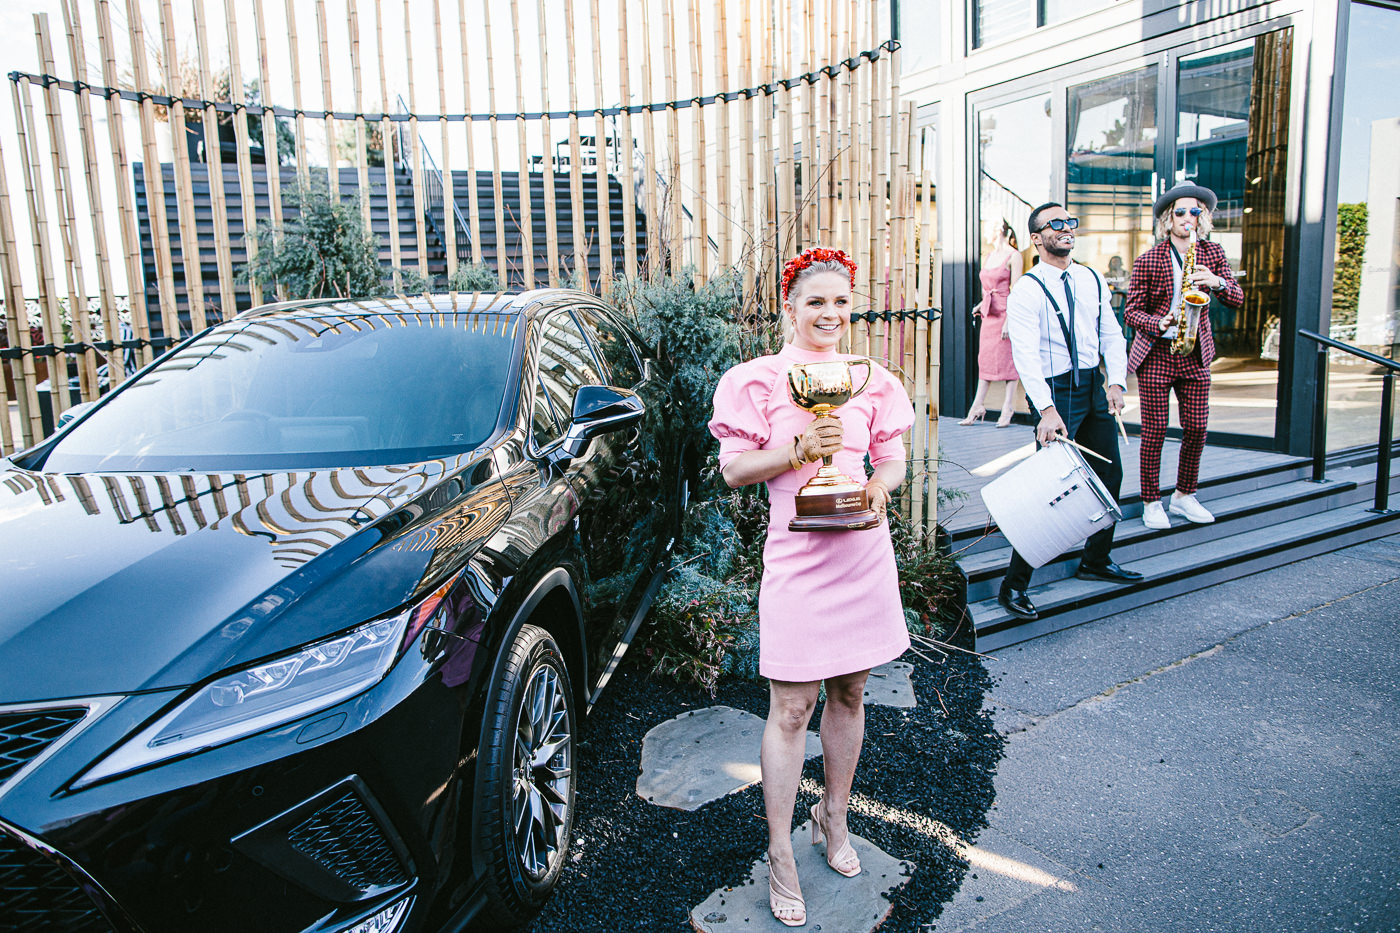 Principal Sponsor Lexus -m Marquee in the Birdcage